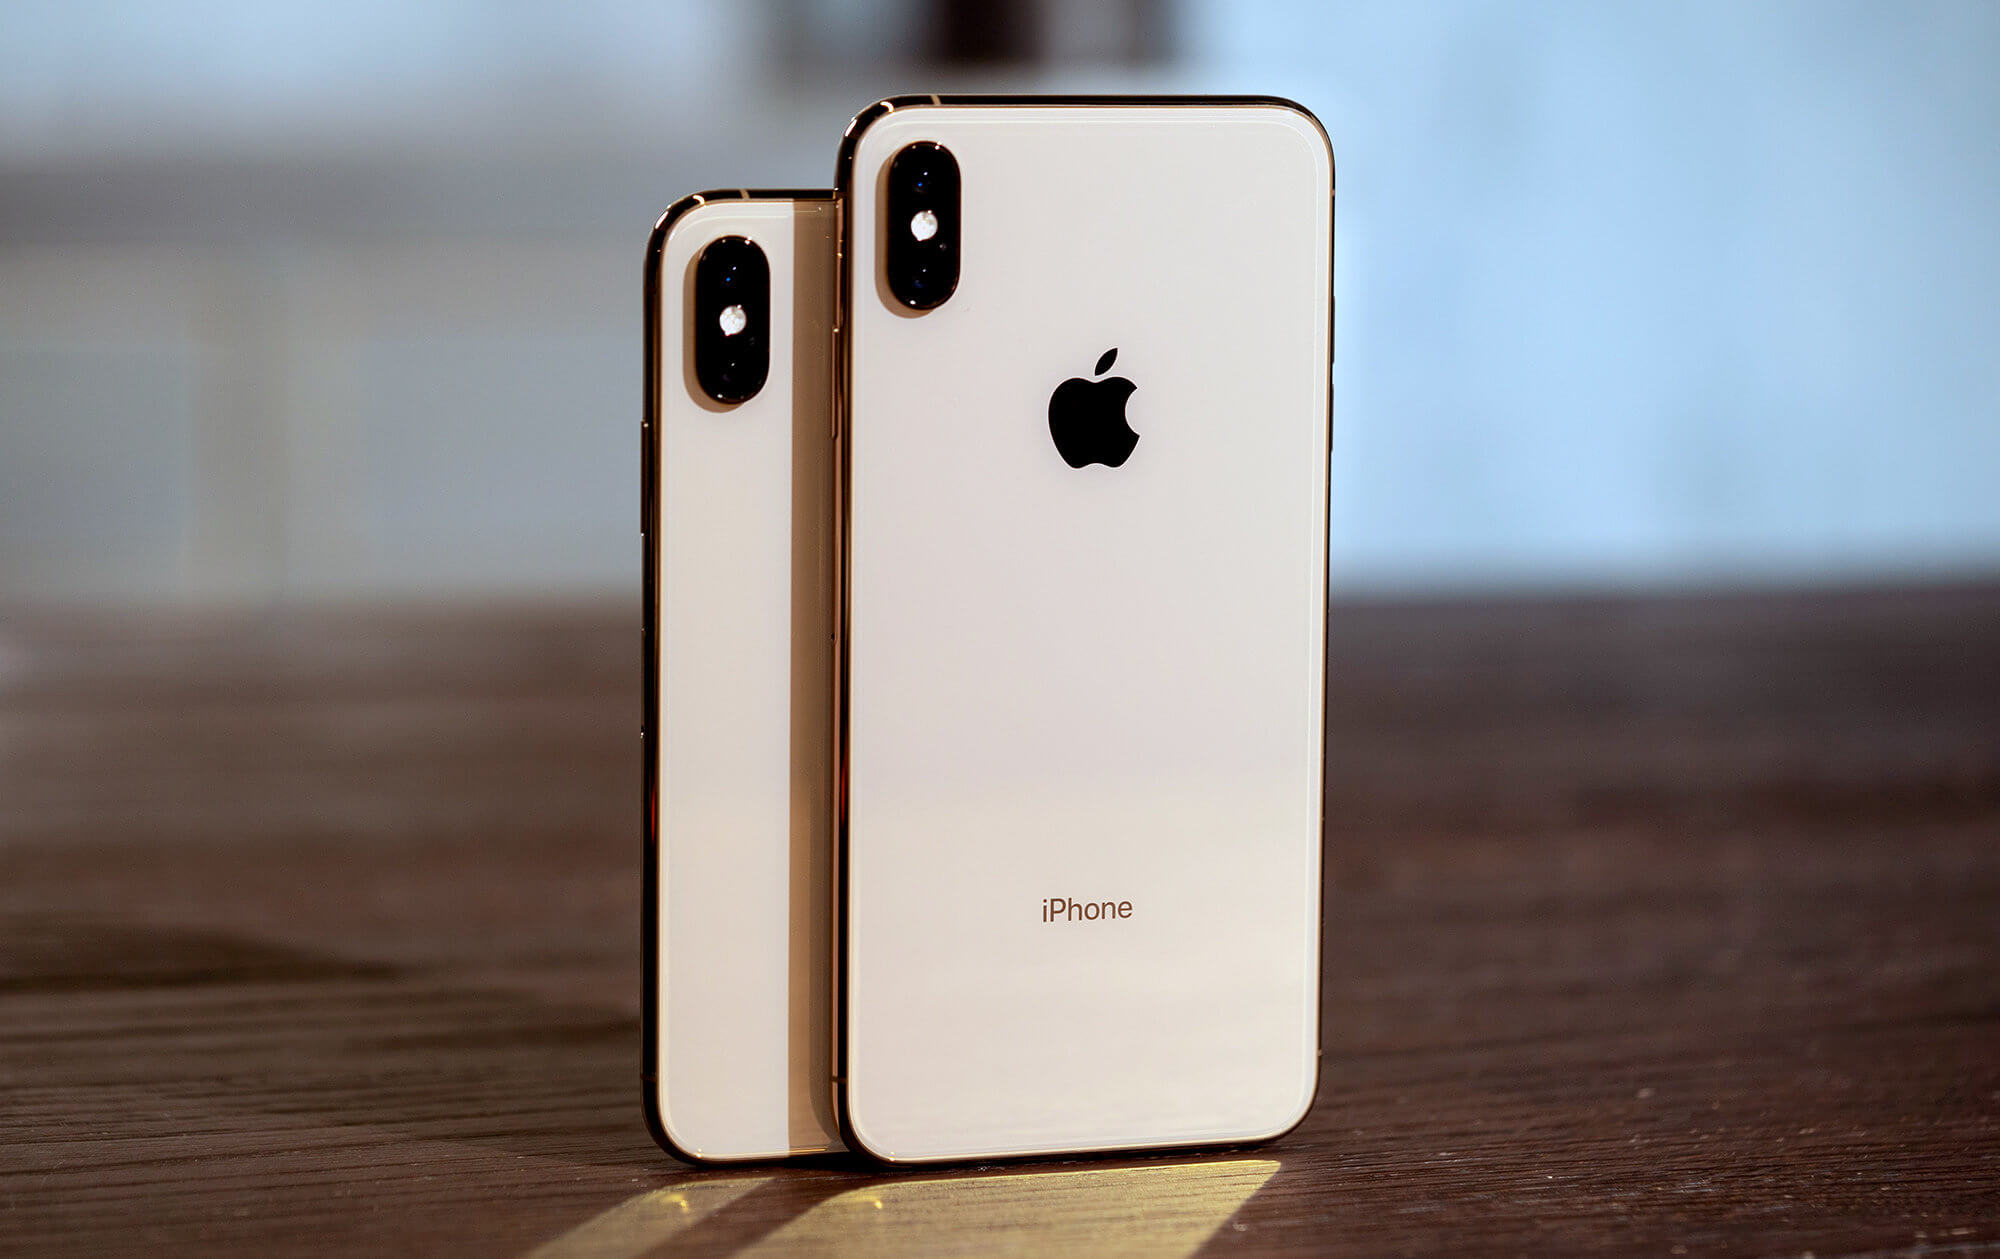 iPhone XS и iPhone XS Max: лучшие из всех iPhone в истории?